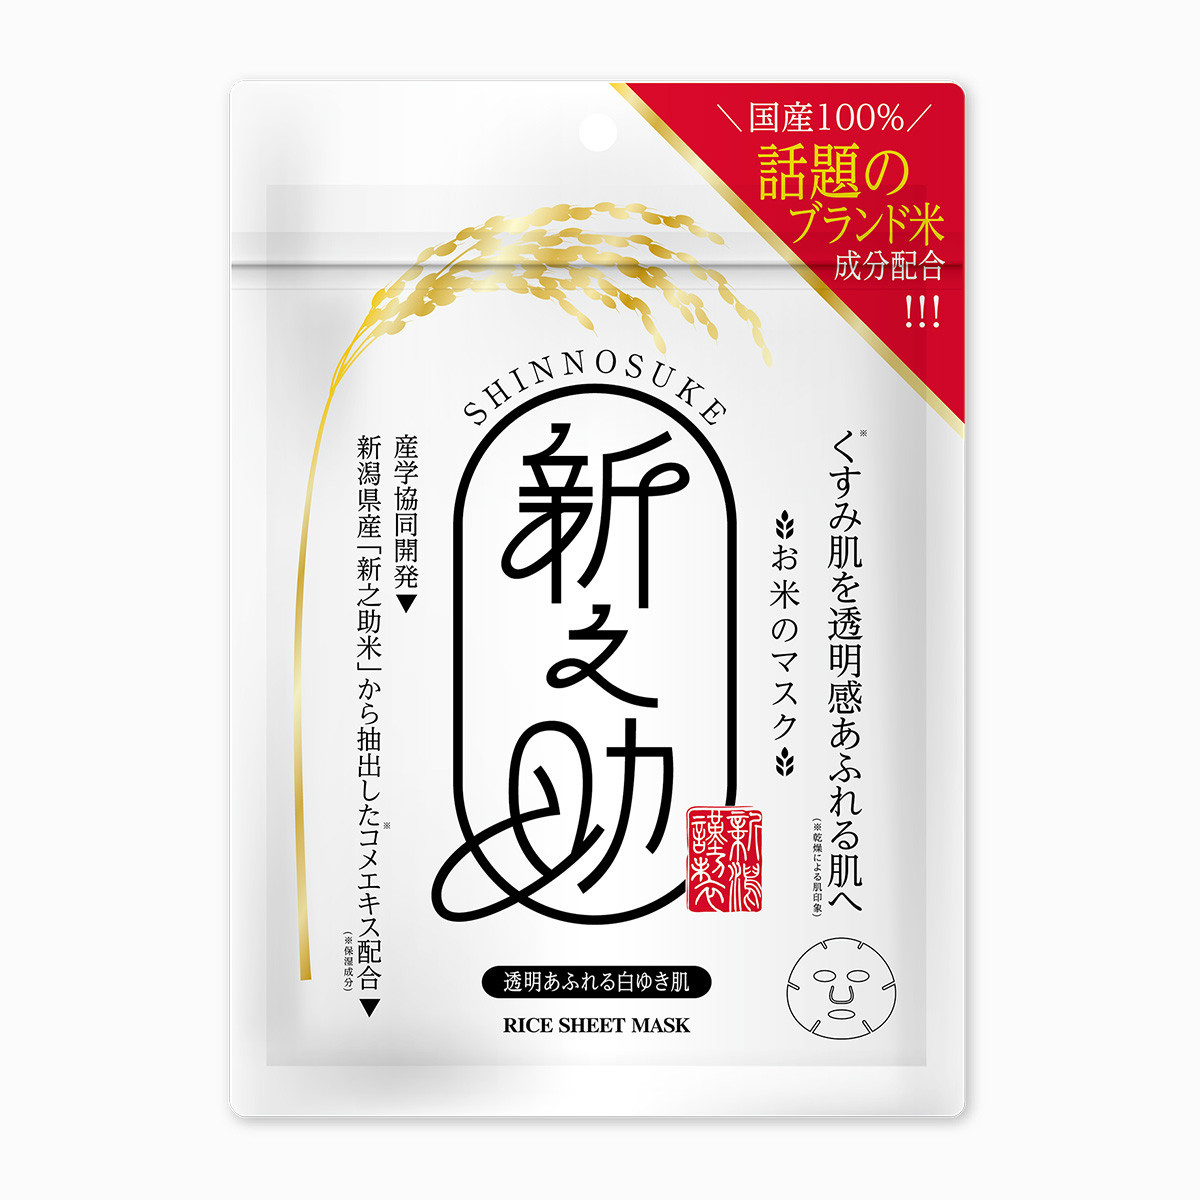 Puresmile Shinnosuke Rice Mask Dullness Care 10pcs